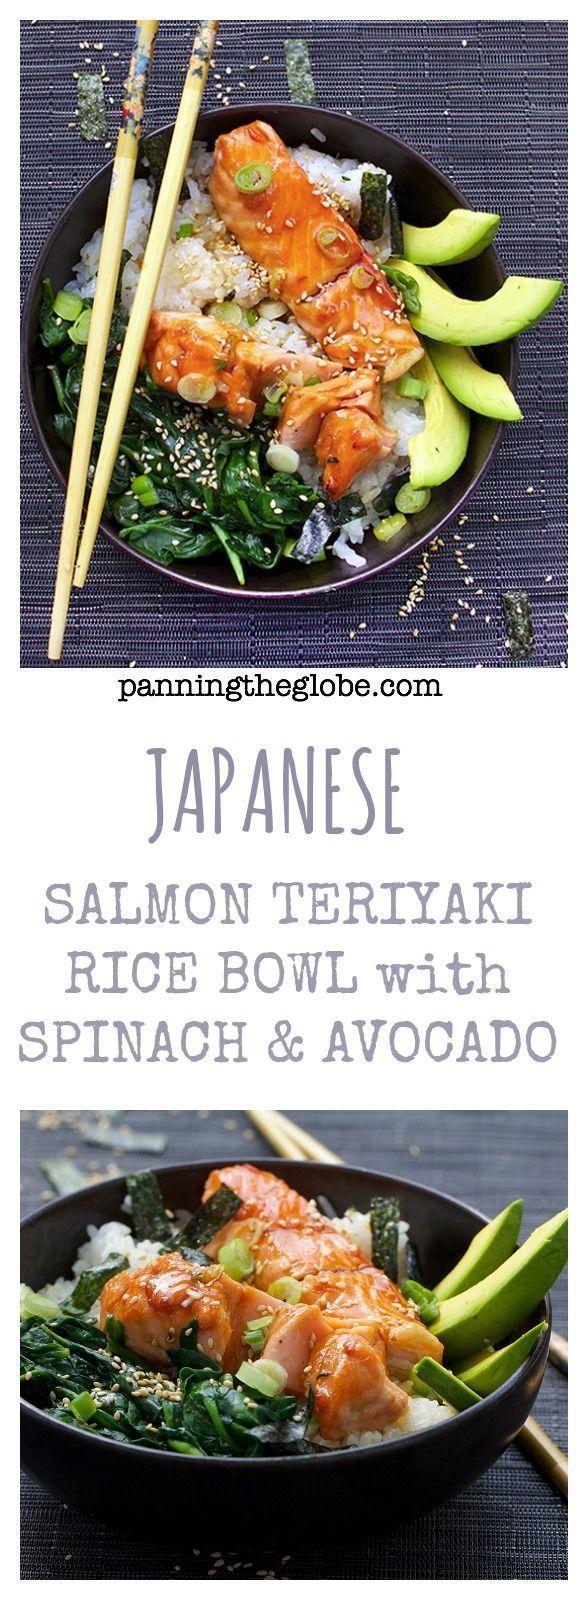 Teriyaki Salmon Rice Bowl with Spinach amp Avocado - Teriyaki Salmon Rice Bowl with Spinach amp Avocado